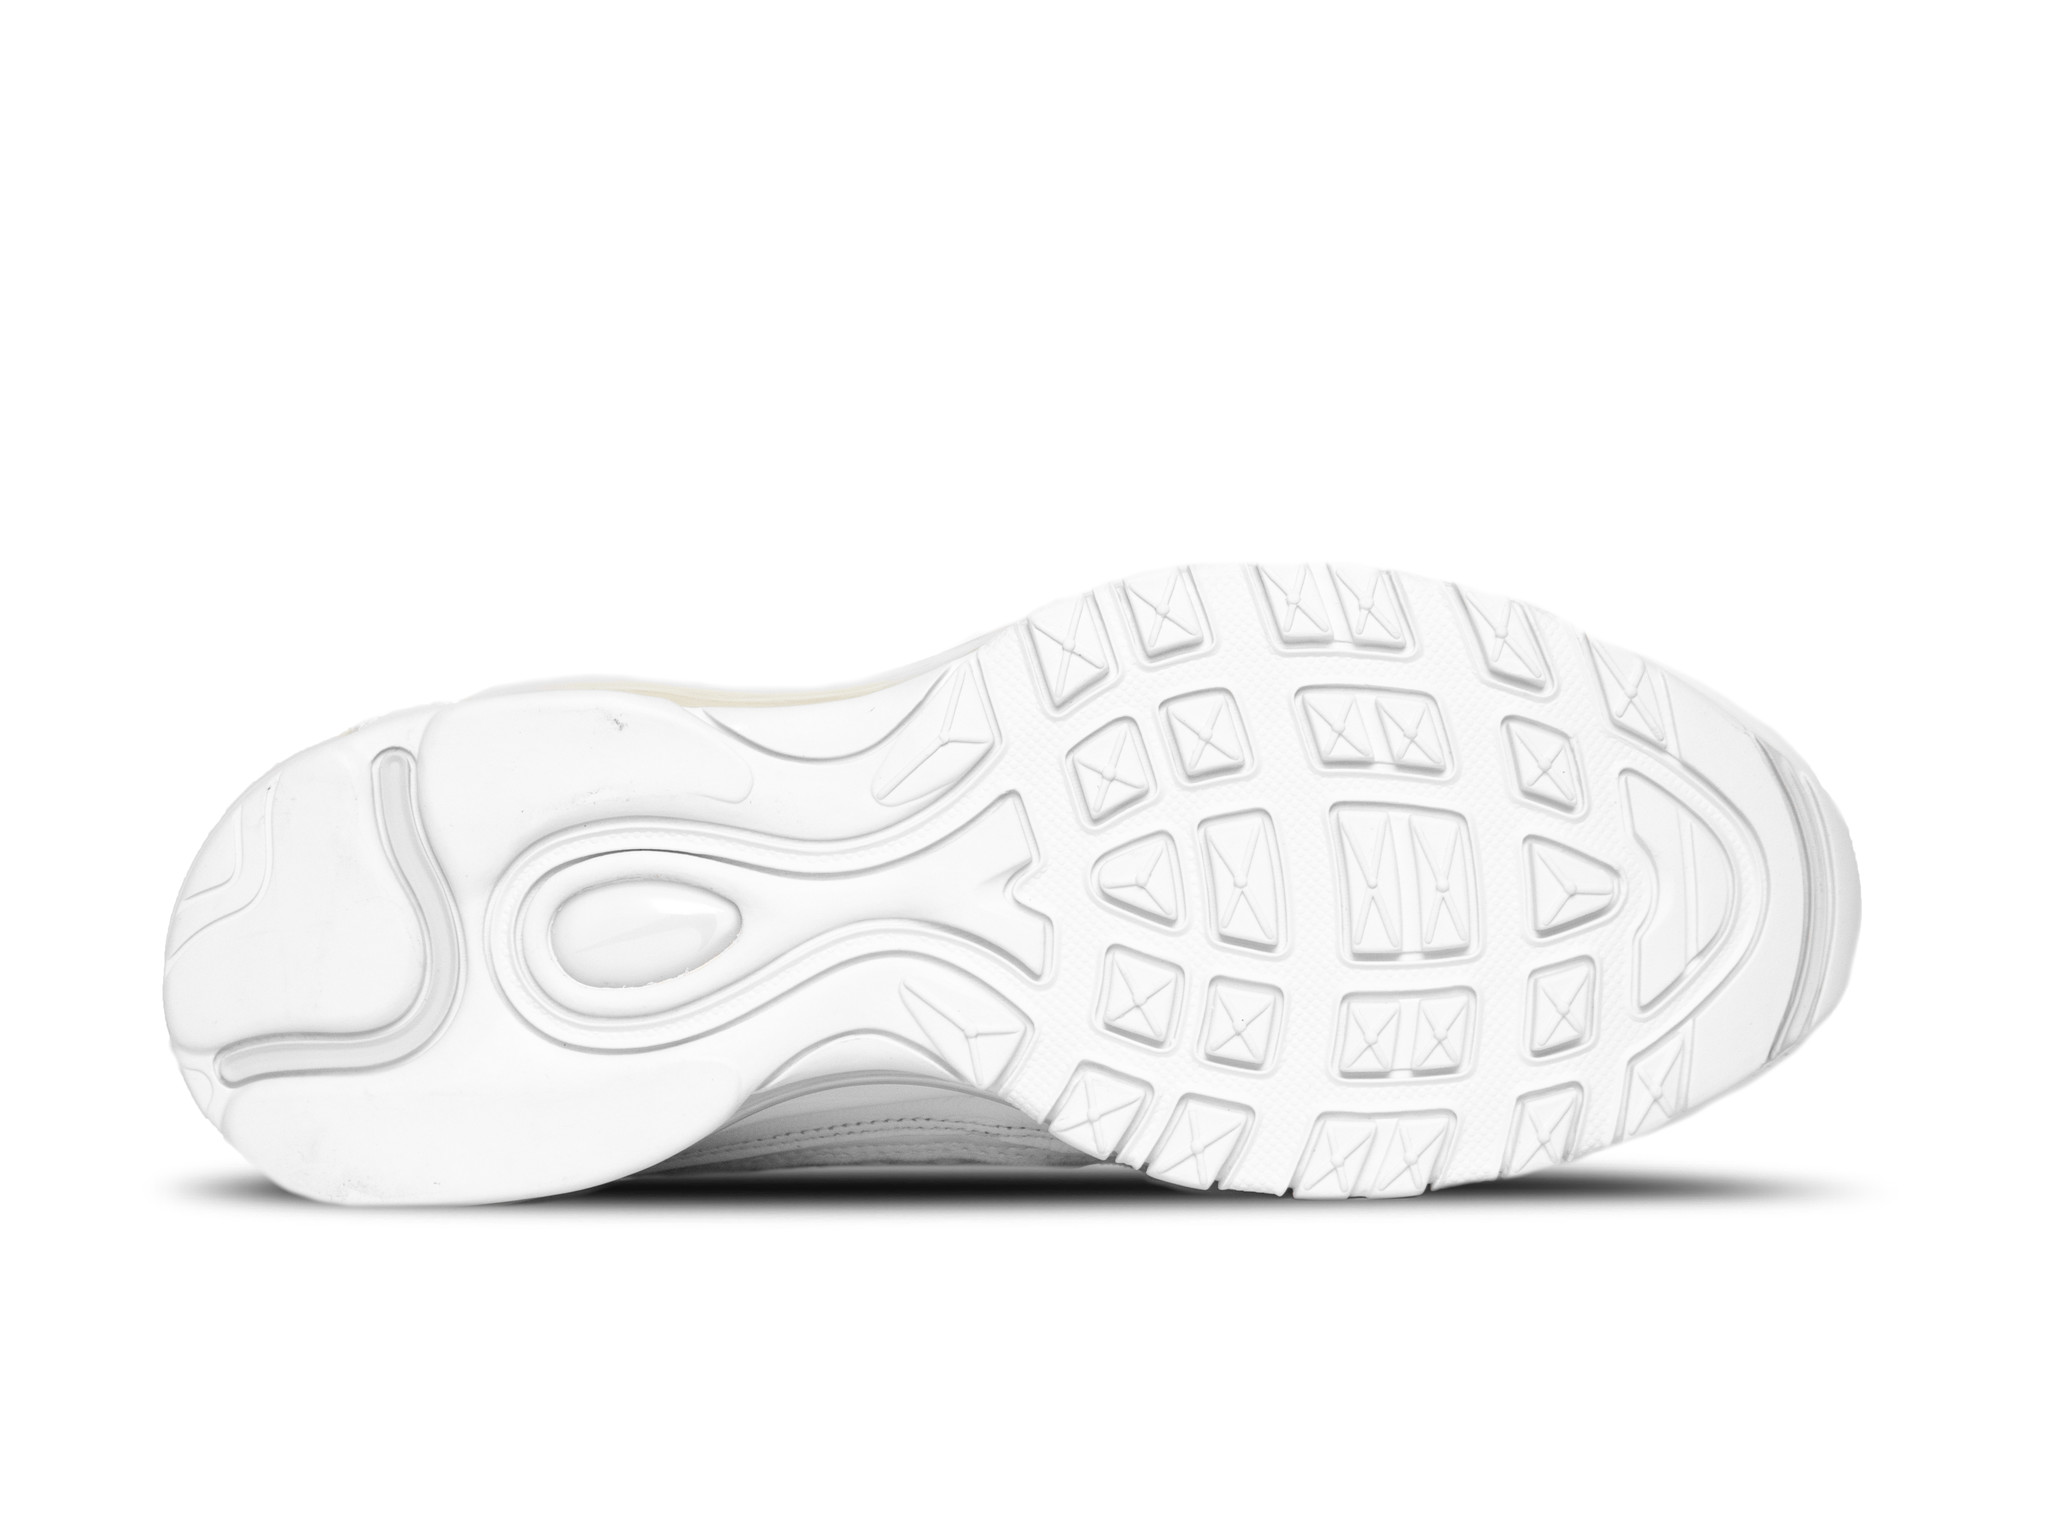 Nike Air Max 98 WhitePure Platinum 640744 106